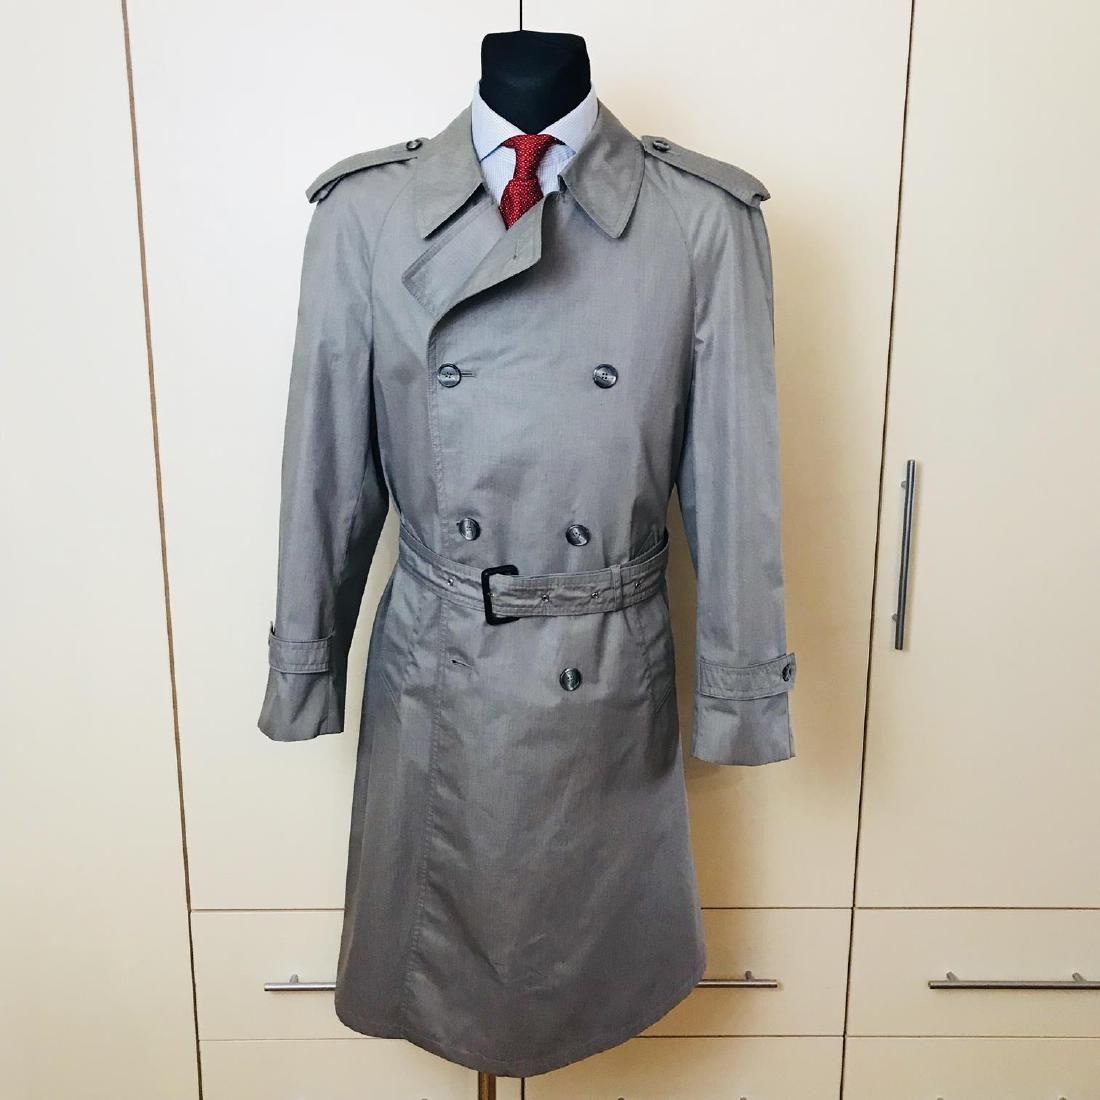 Vintage Men's Trench Coat Size US 40 EUR 50